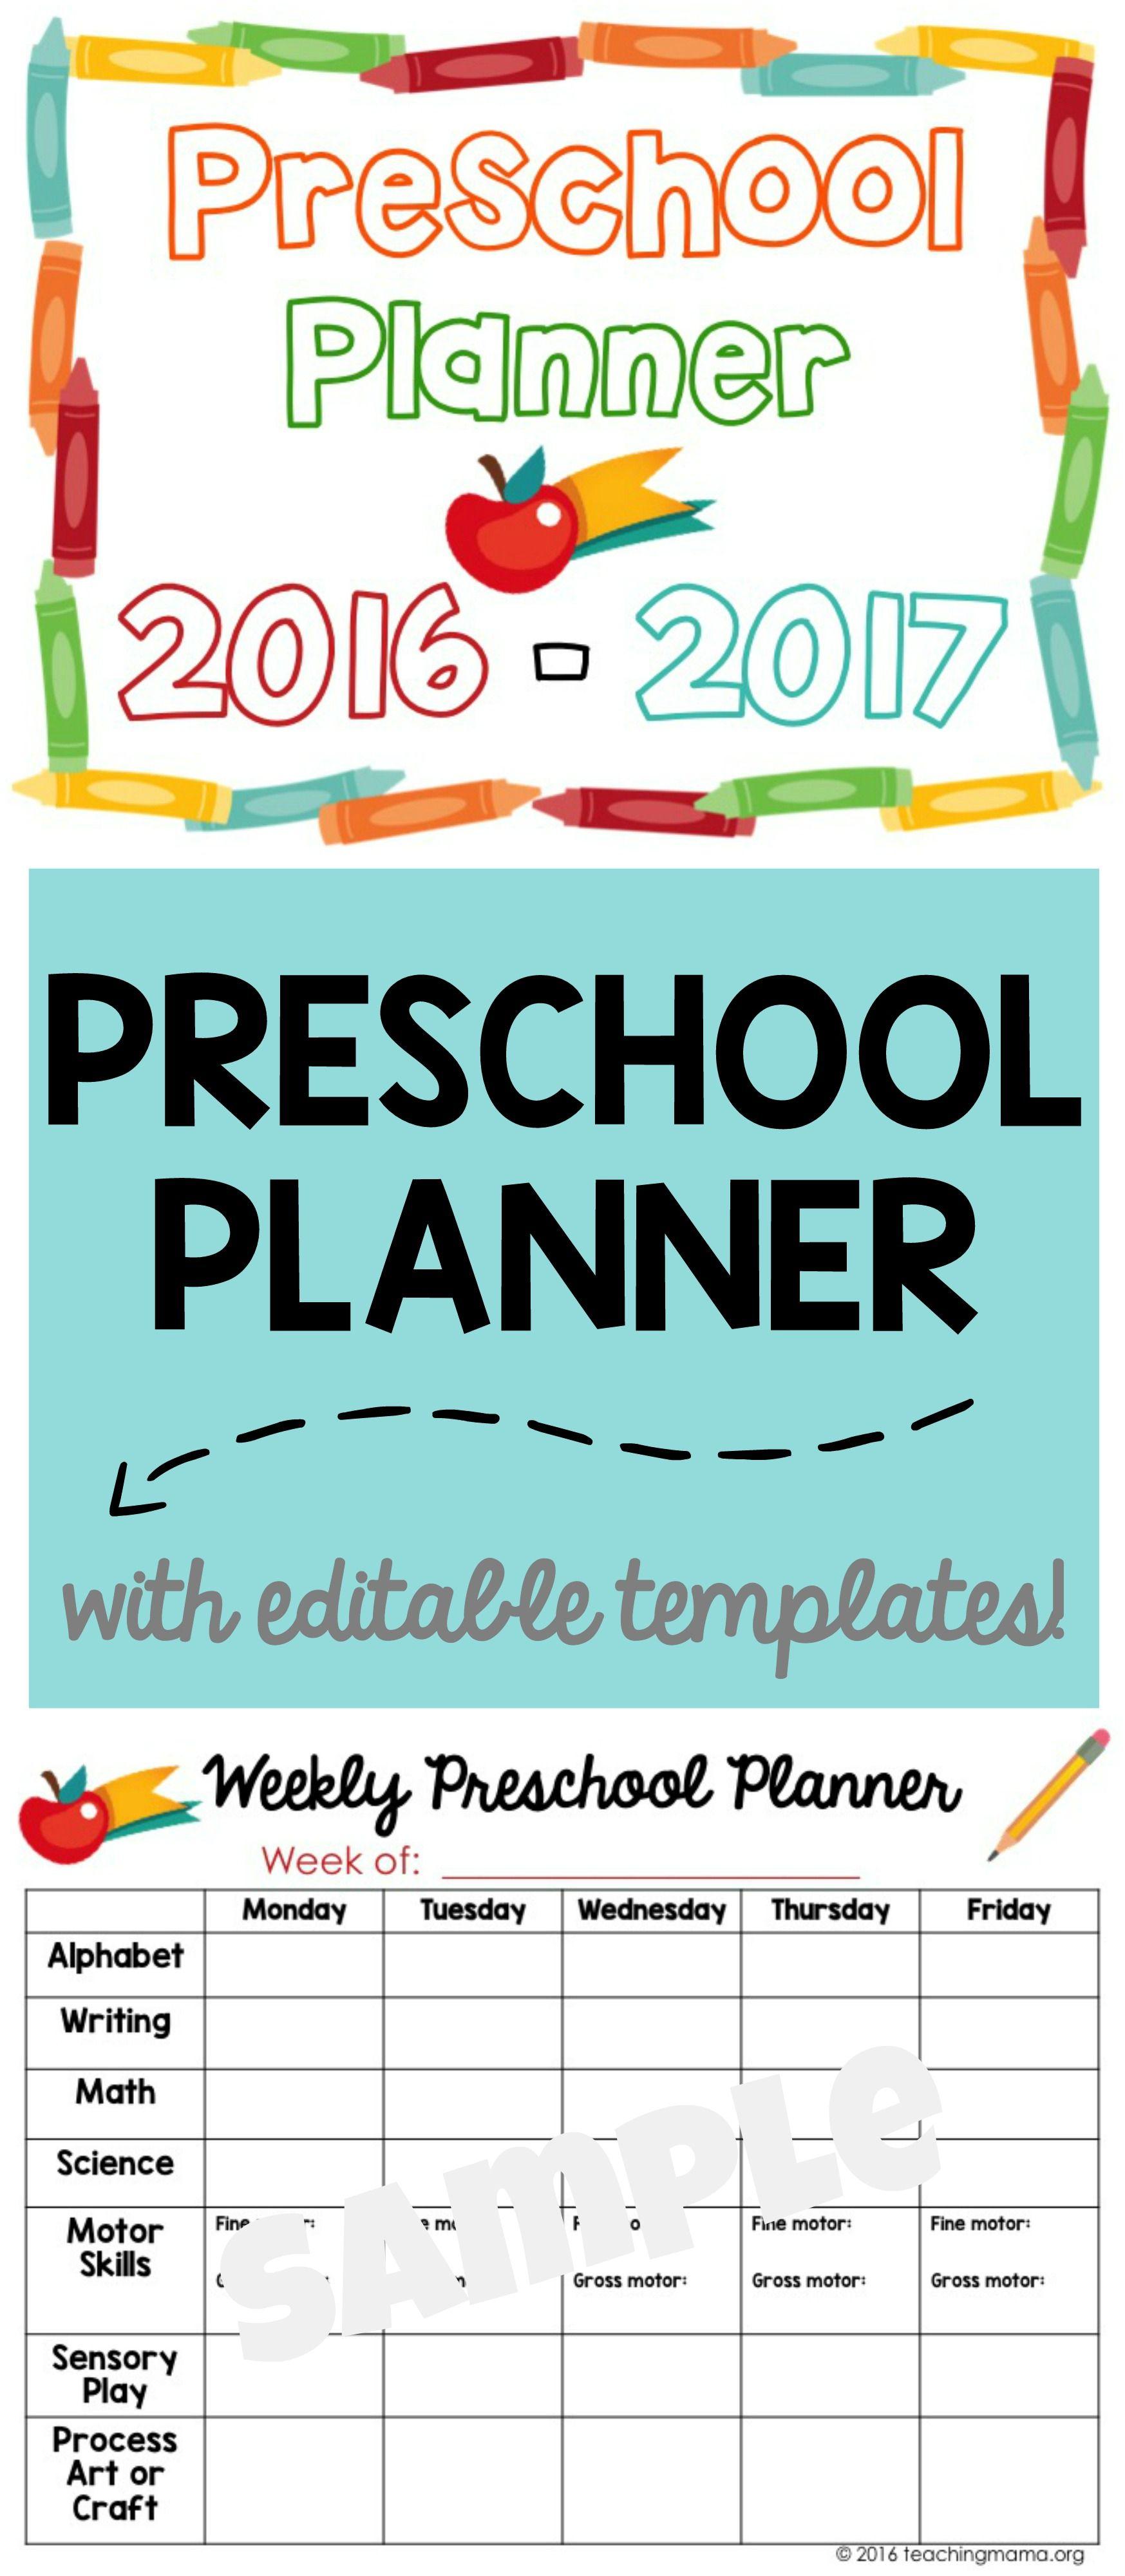 Printable Preschool Planner - On Sale Now   Pinterest   Preschool ...